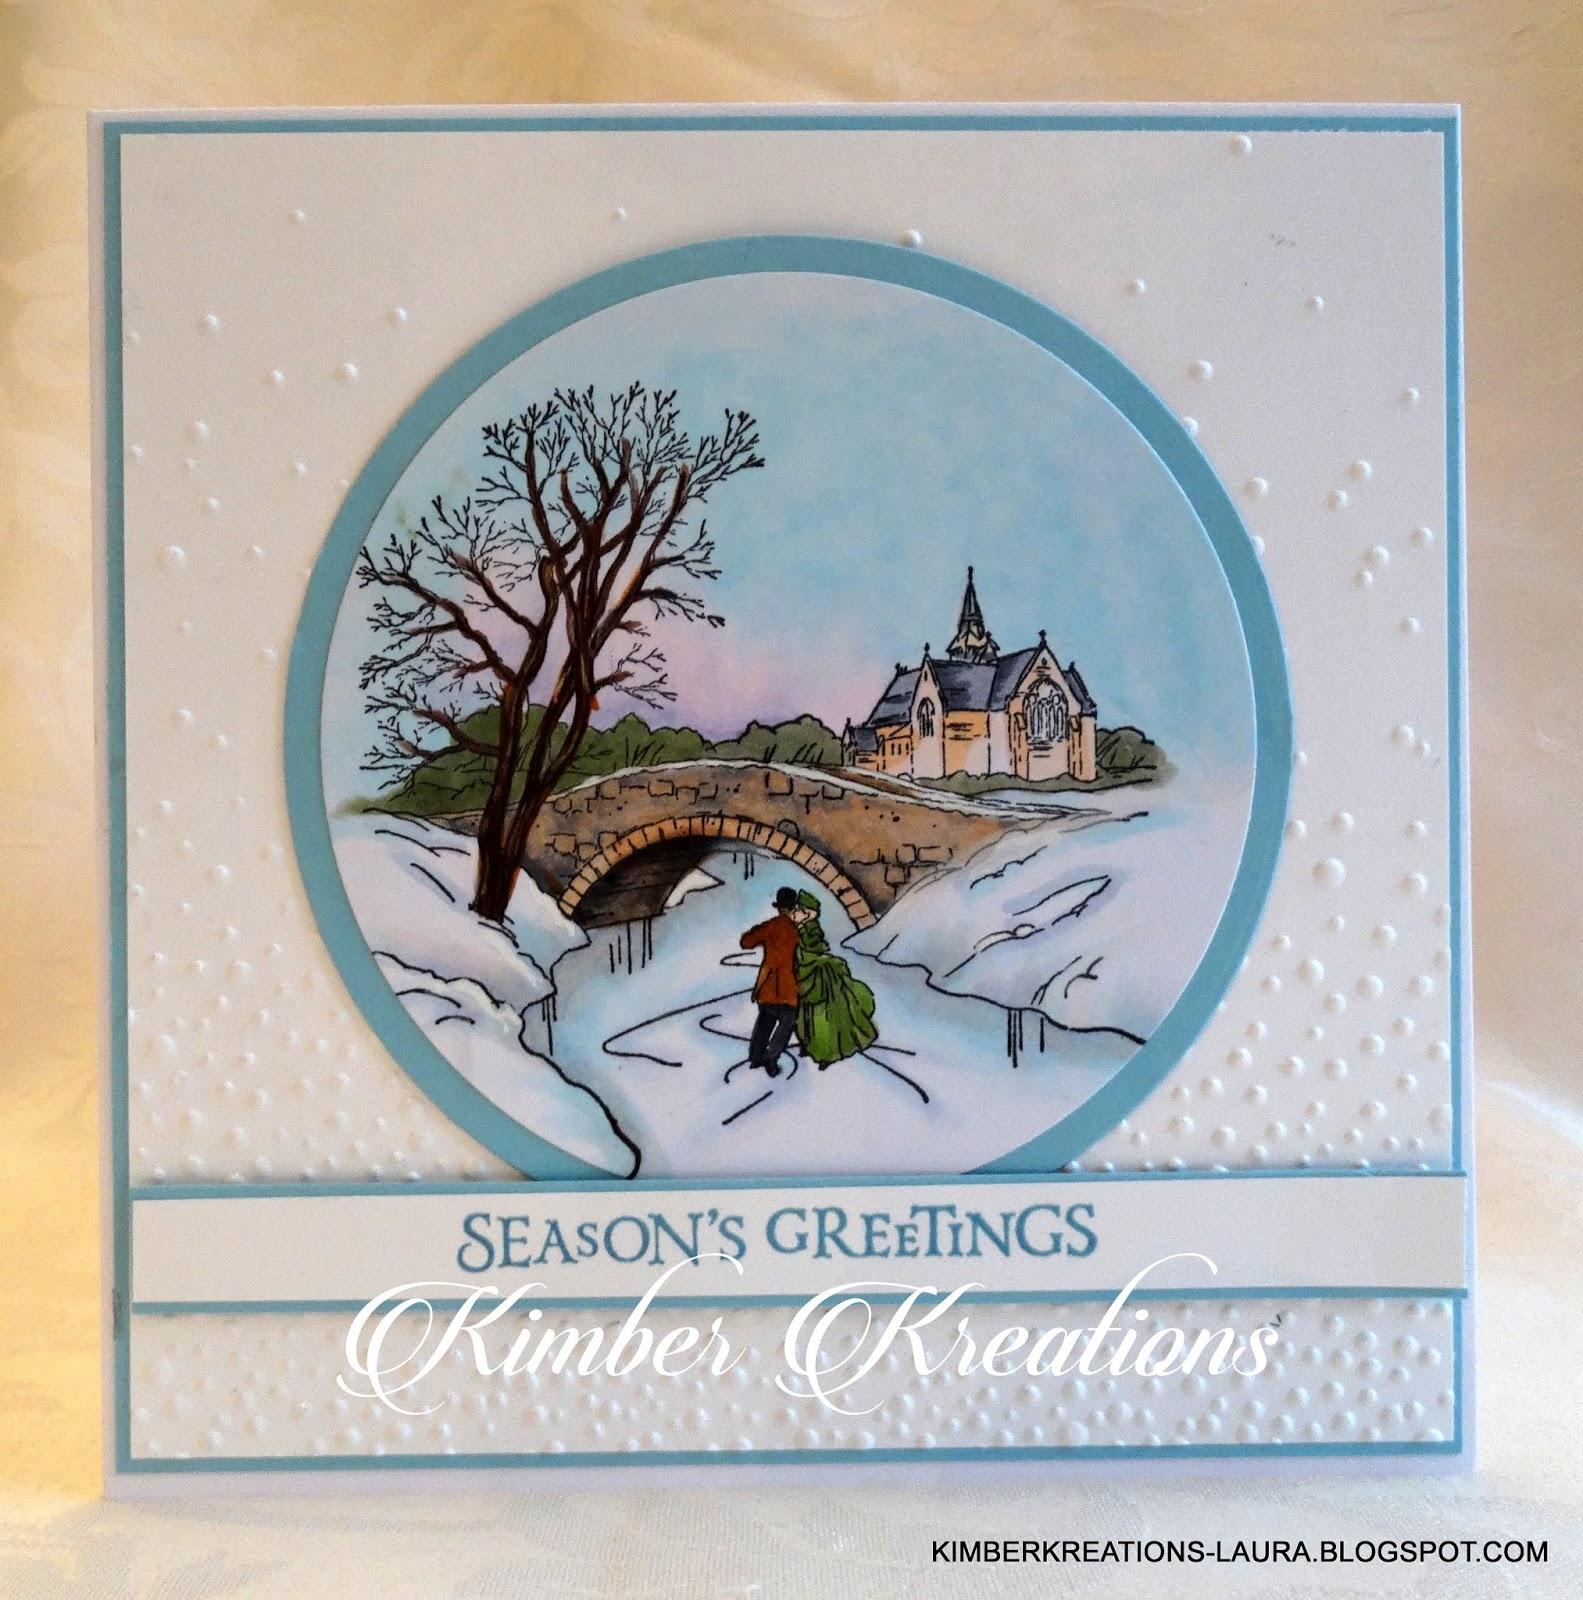 Kimber Kreations Cambridge Carols Christmas Card